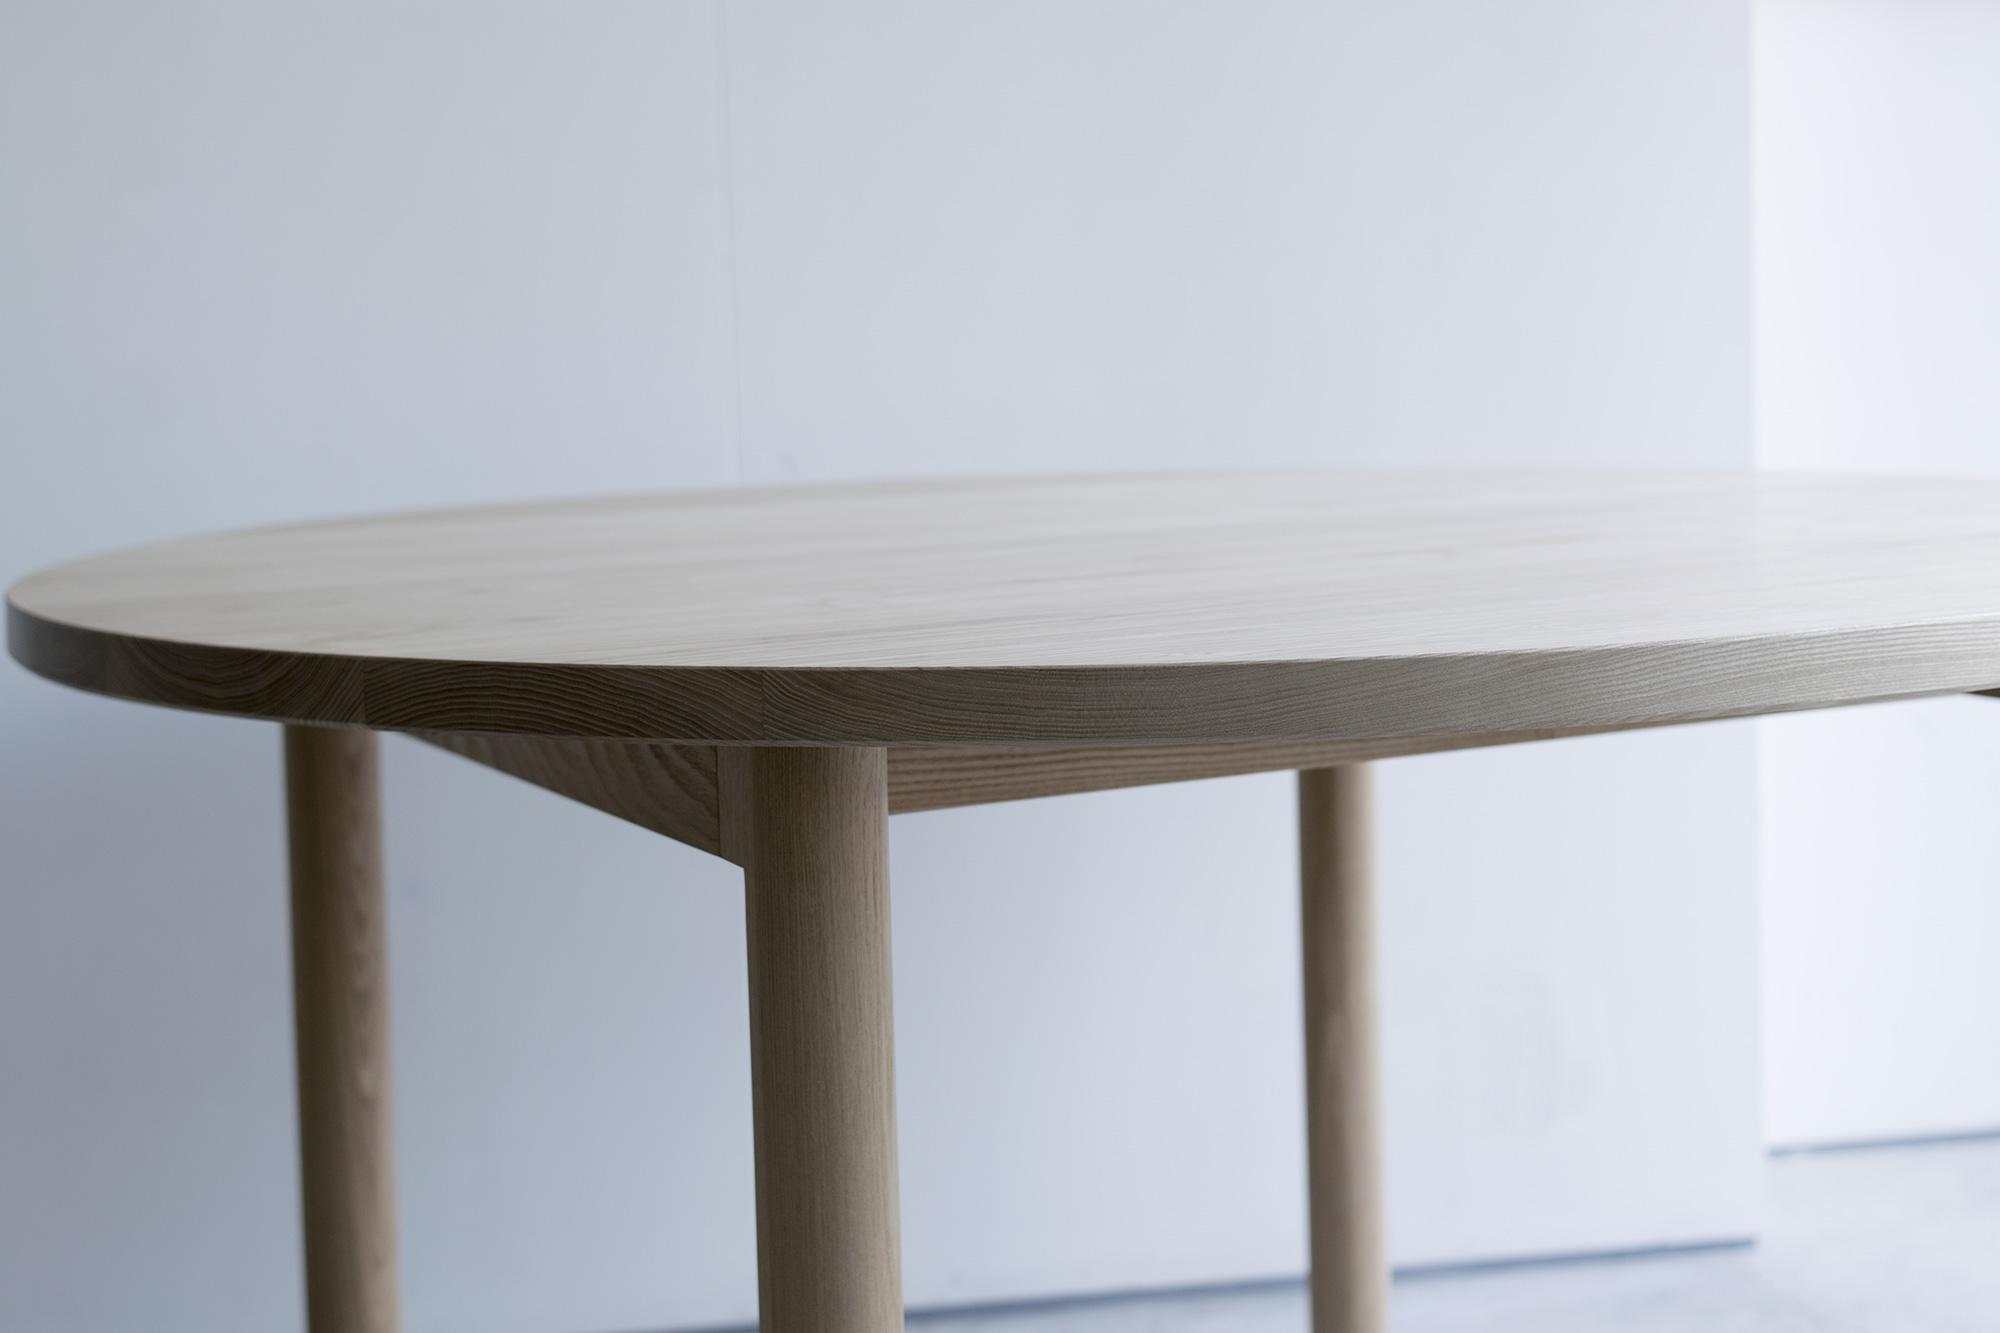 STANDARD TABLE R / ROUND 特徴的な脚部デザイン